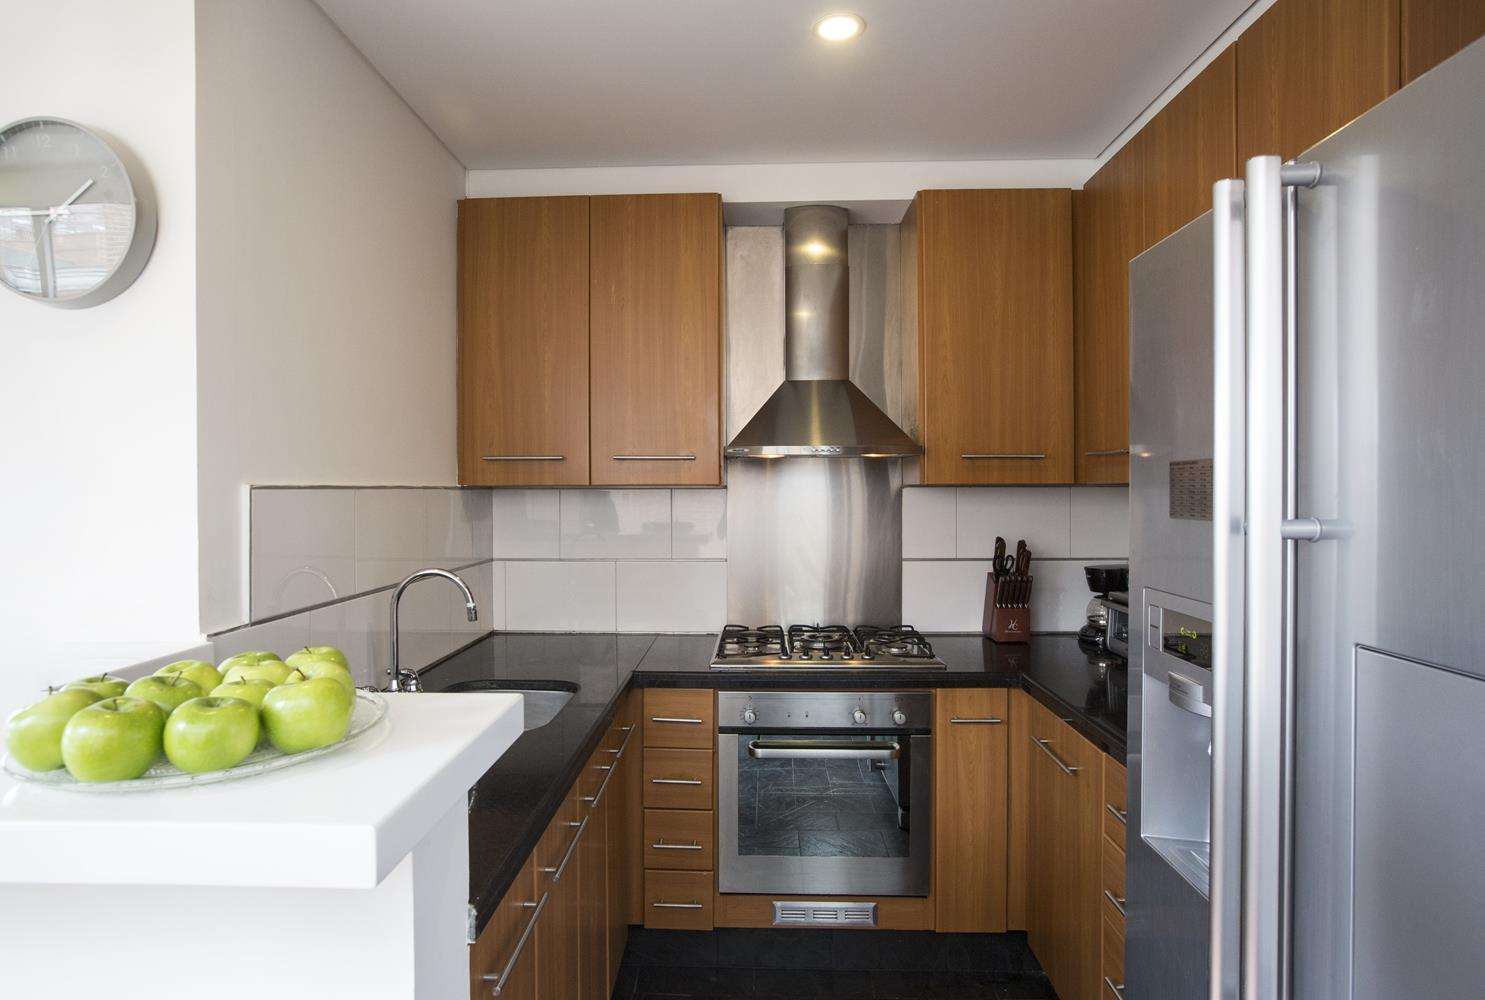 Kitchen at Soho93 Apartments